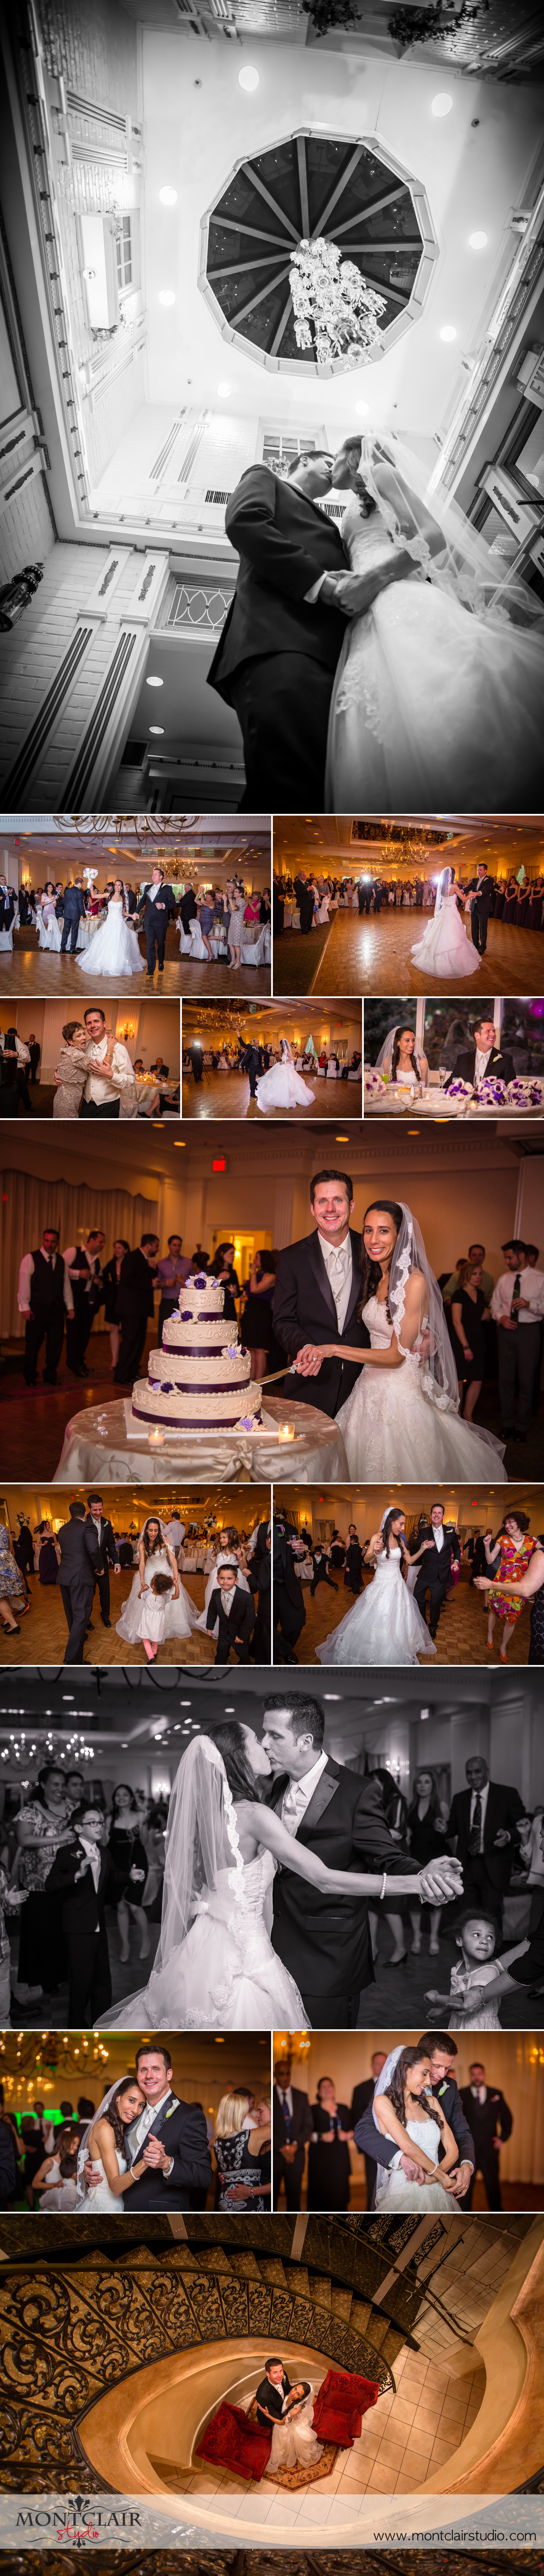 Tom and Linda wedding 4.jpg